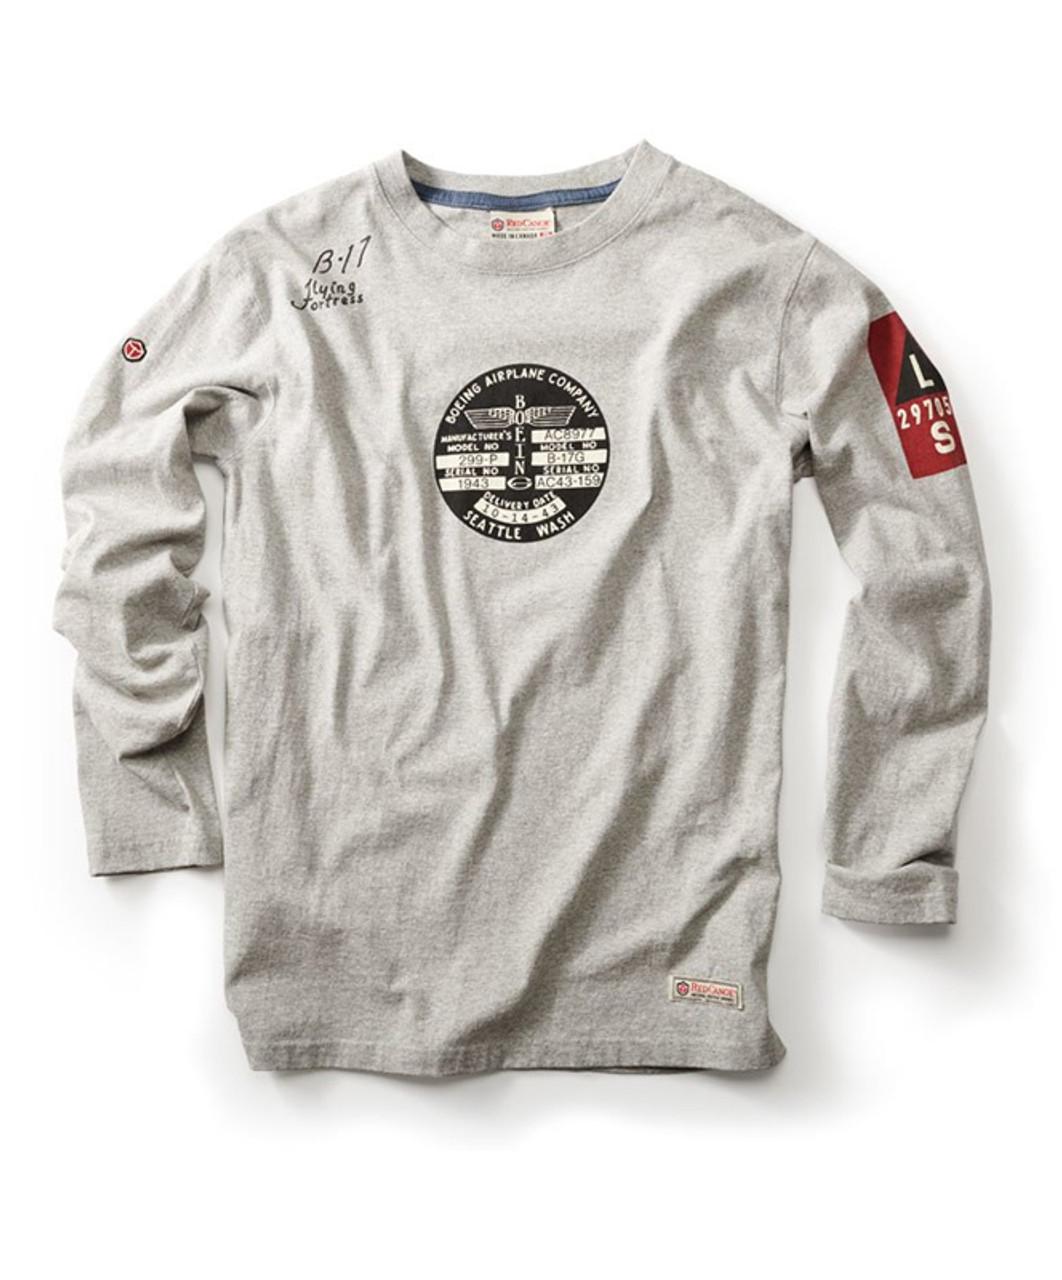 XS-2XL INTERESTPRINT Mens Hoodies Shirts New York Pattern Casual Short Sleeve Hooded T-Shirt